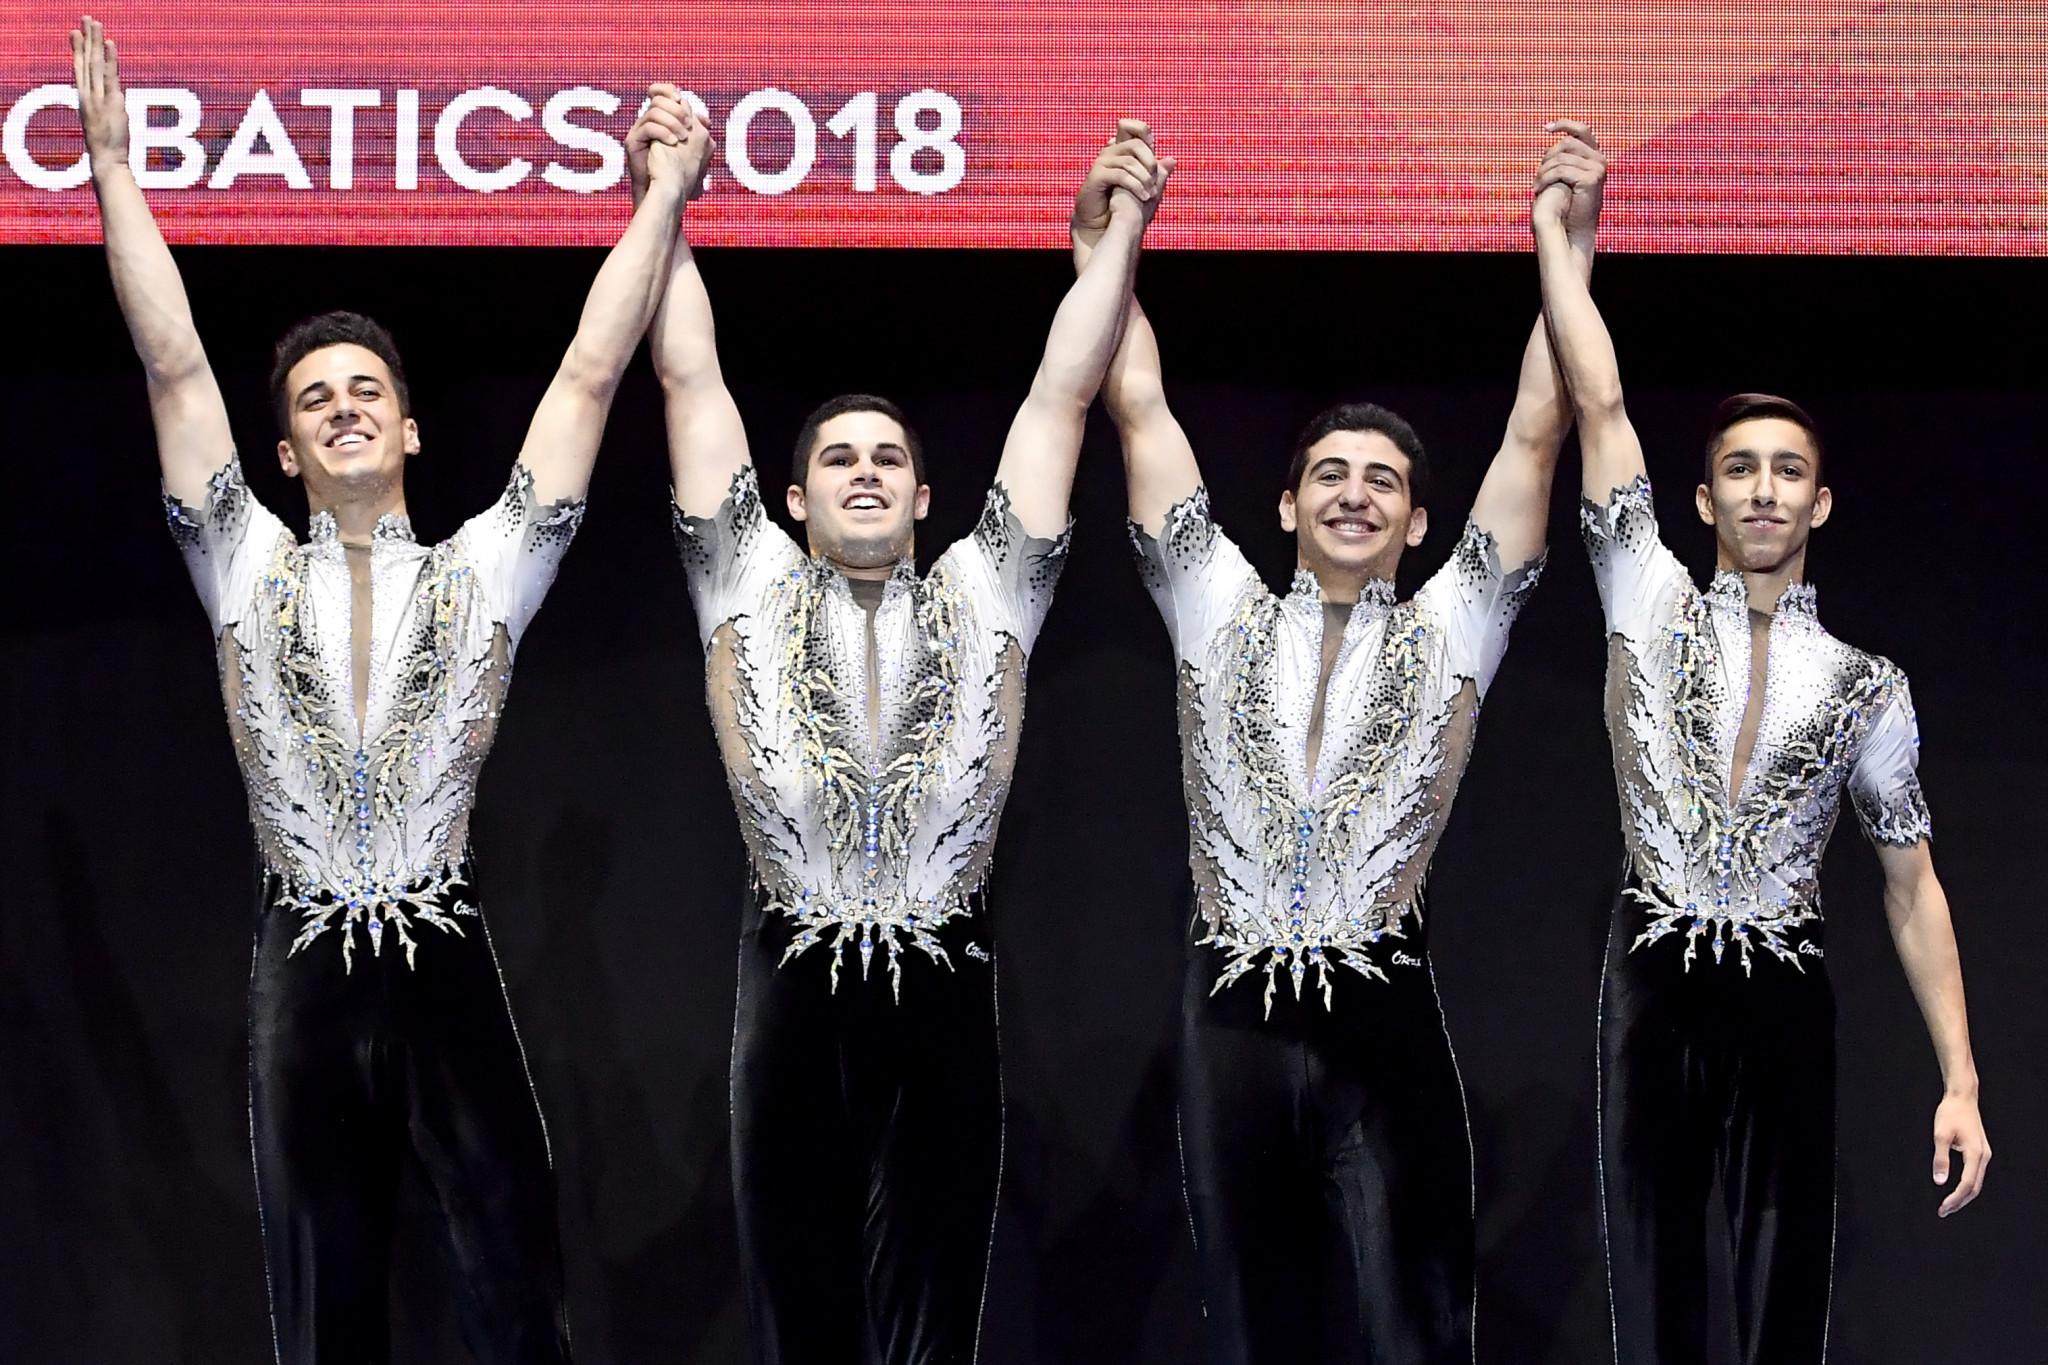 FIG awards 2024 Acrobatic Gymnastics World Championships to Israel